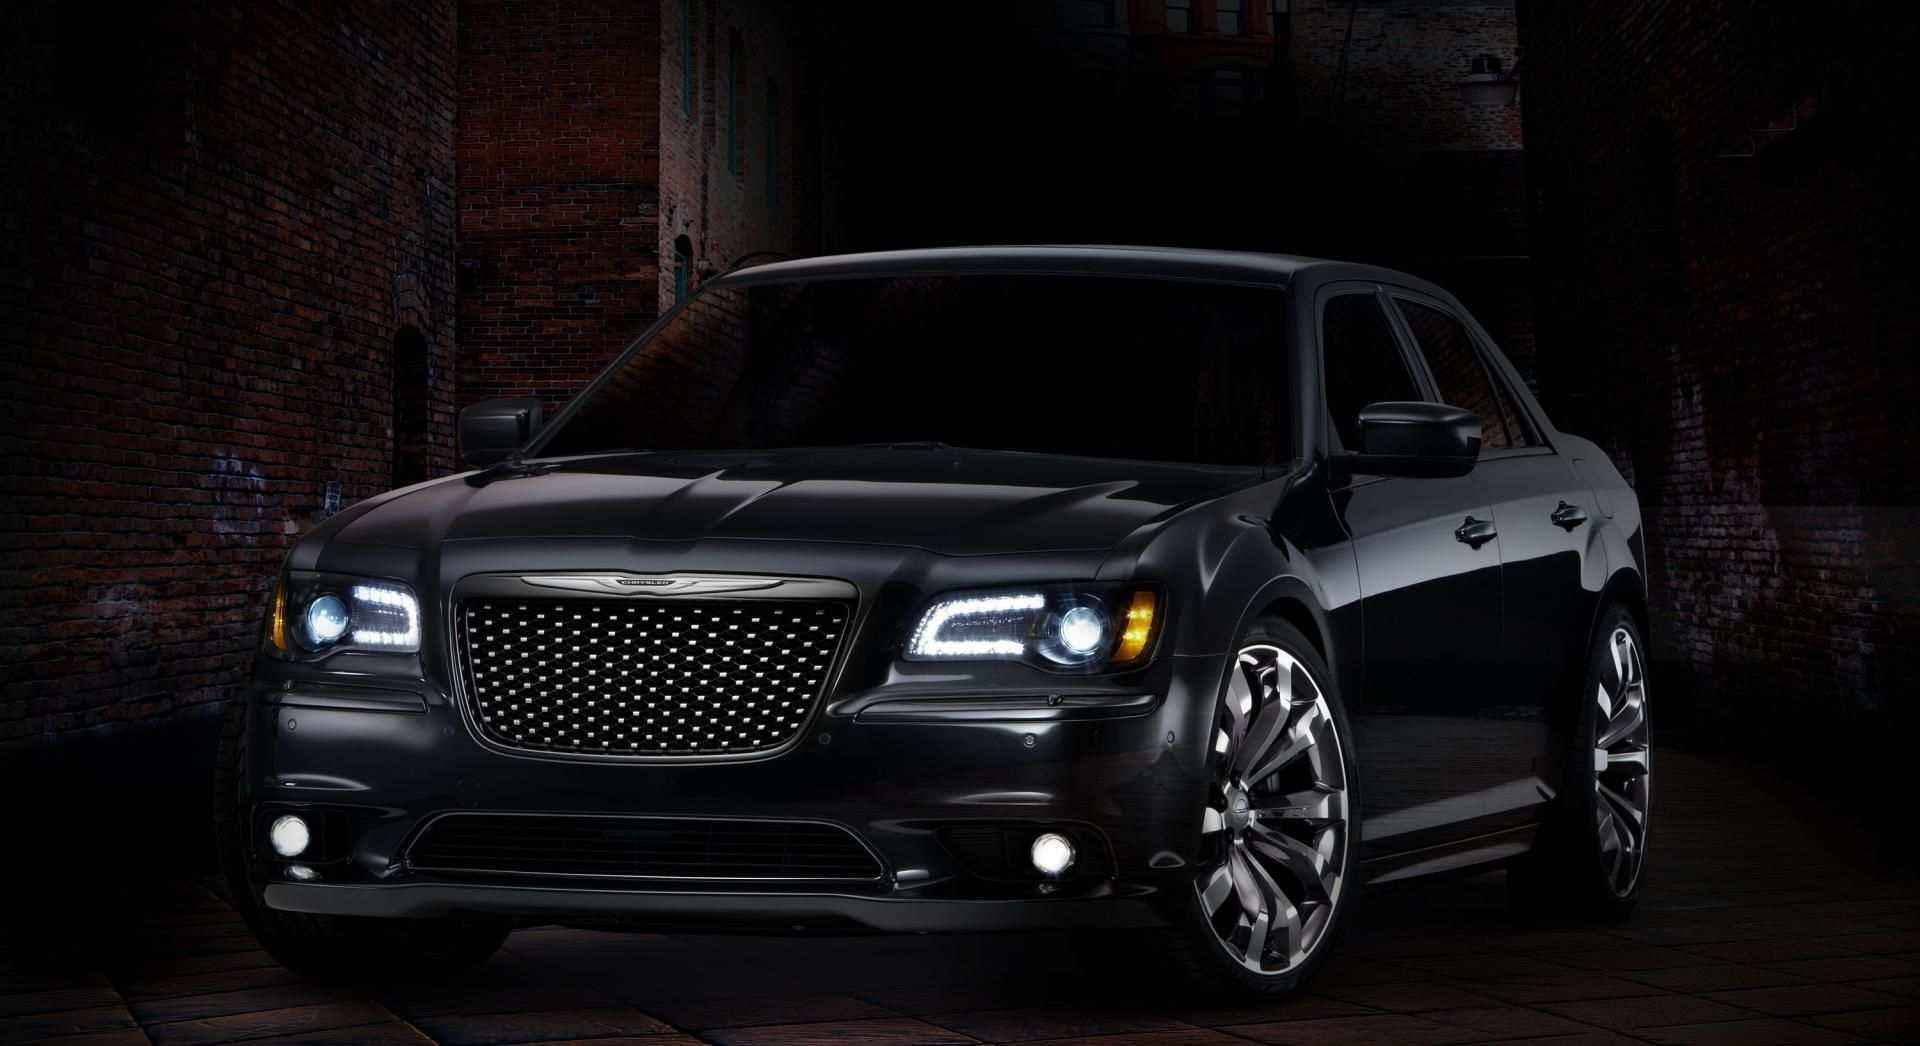 13 Great New Chrysler 2020 Specs with New Chrysler 2020